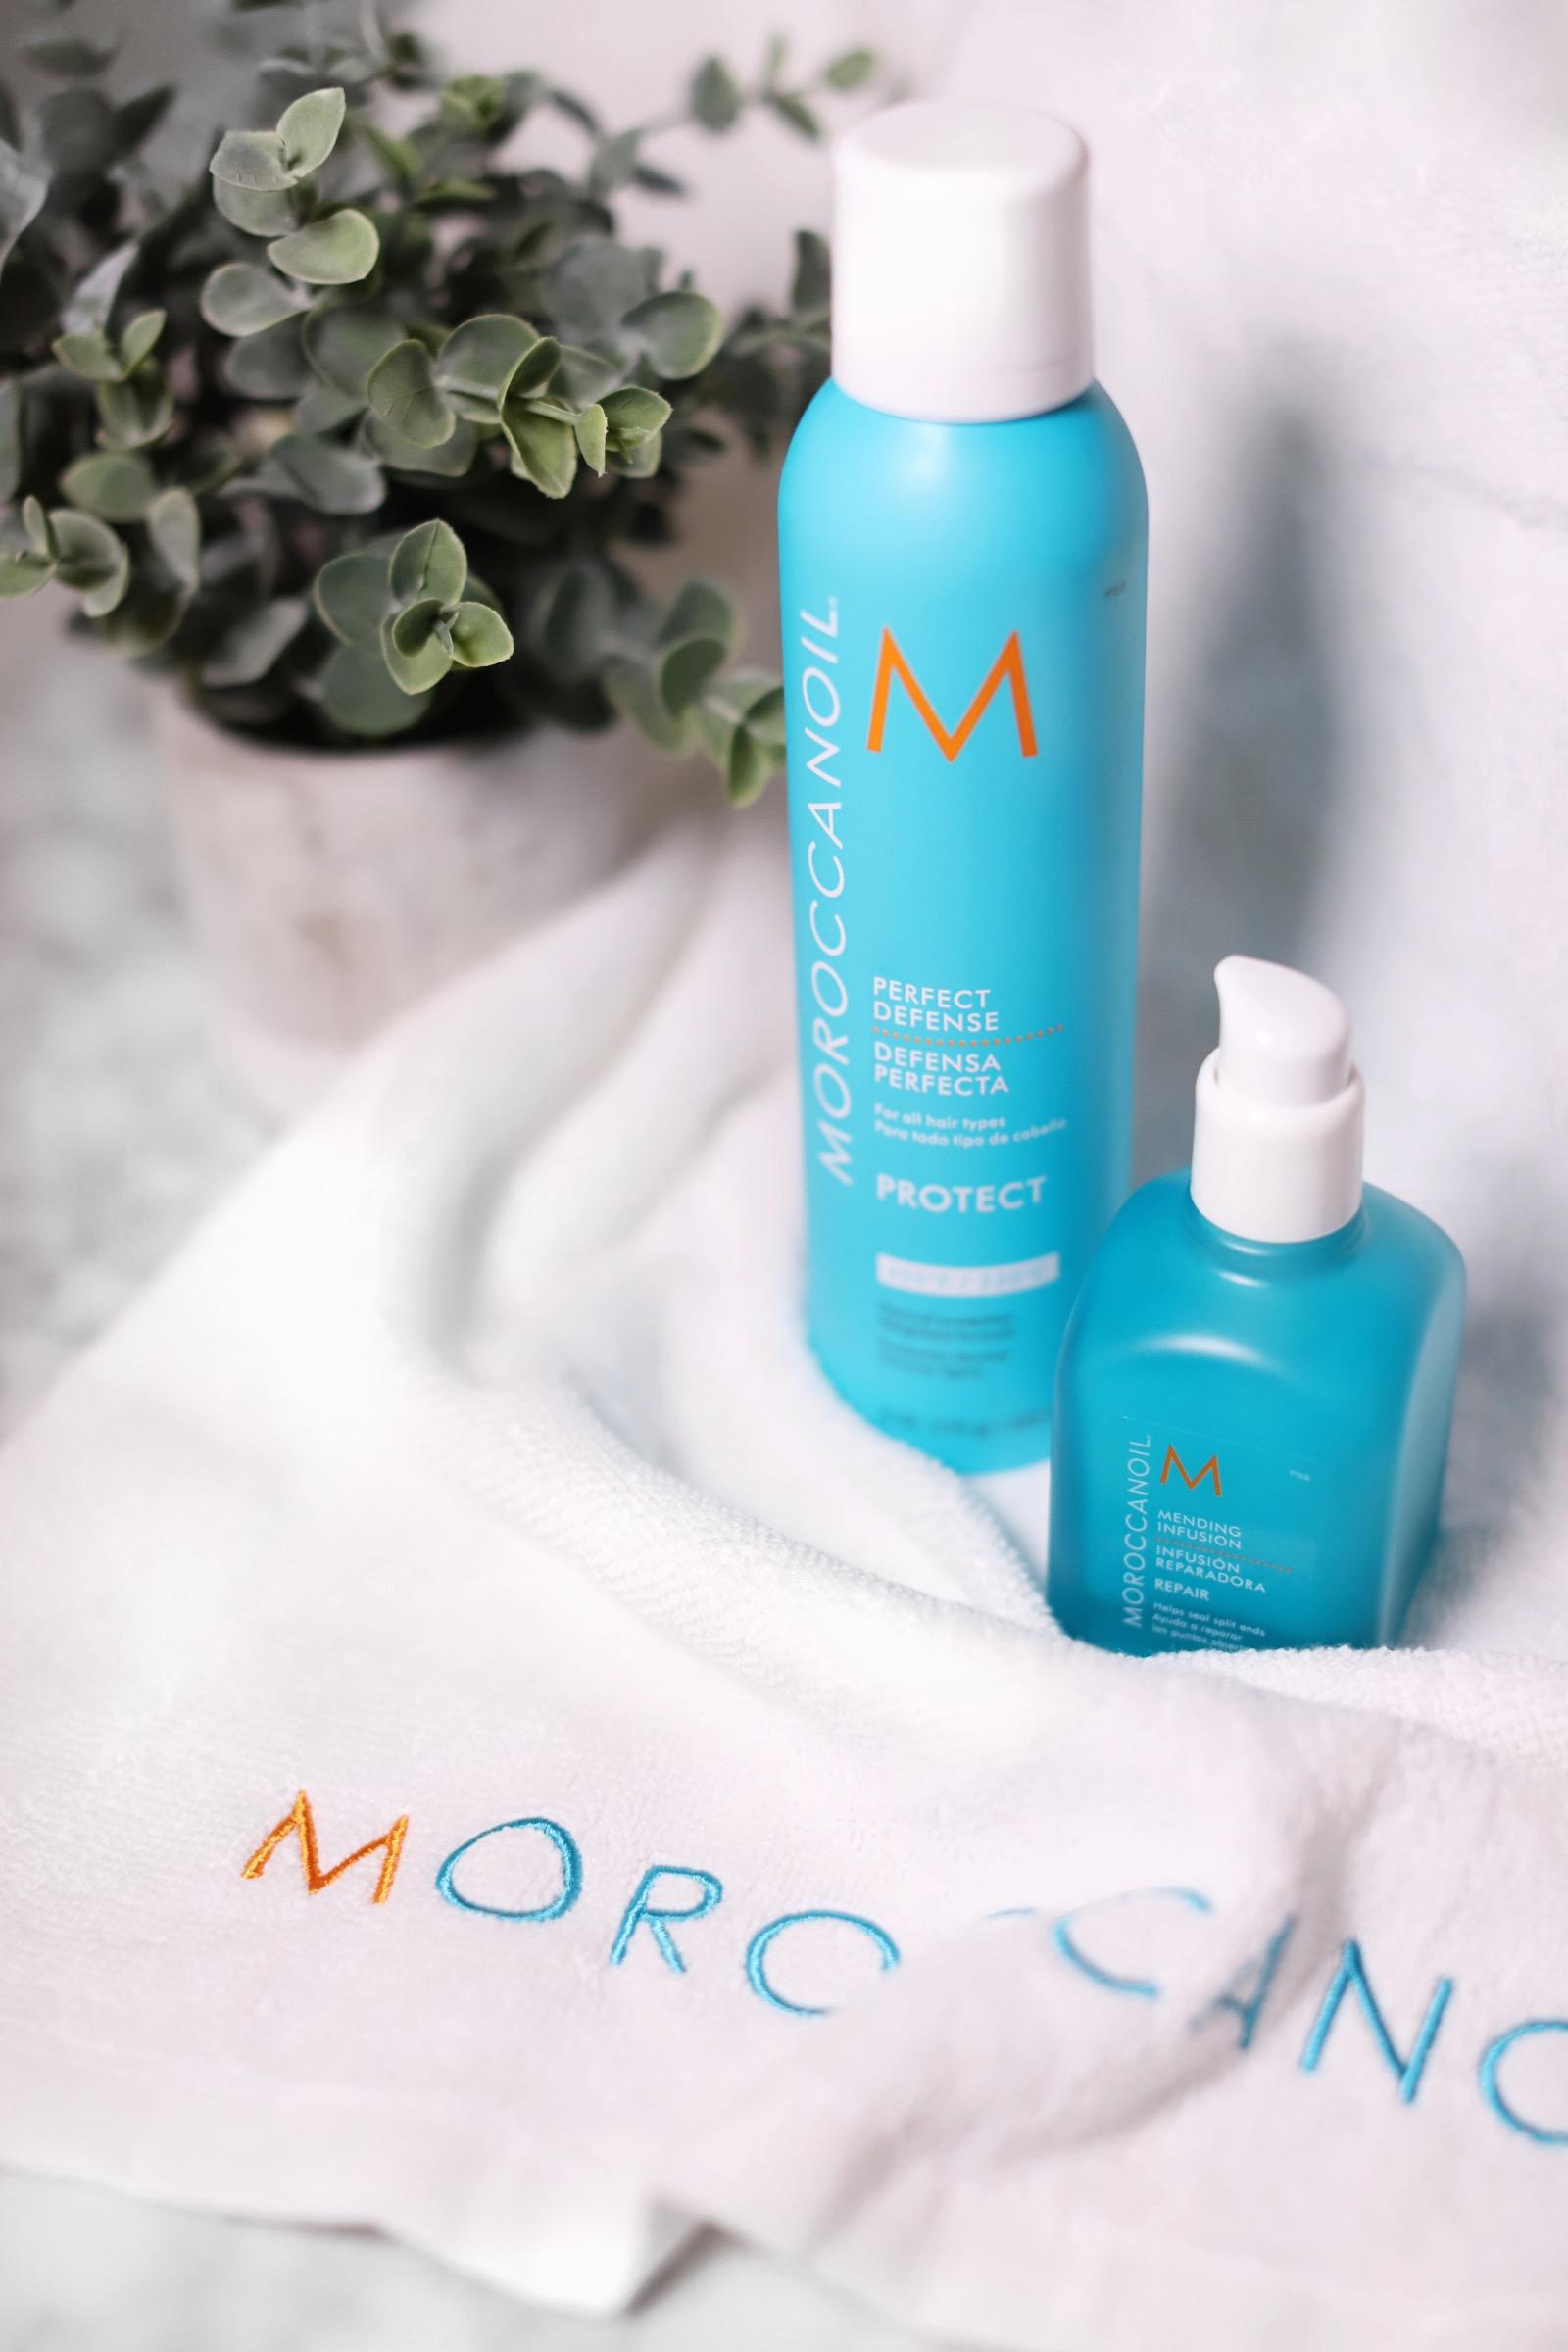 (Left) Moroccanoil® Perfect Defense   (Right) Moroccanoil® Mending Infusion